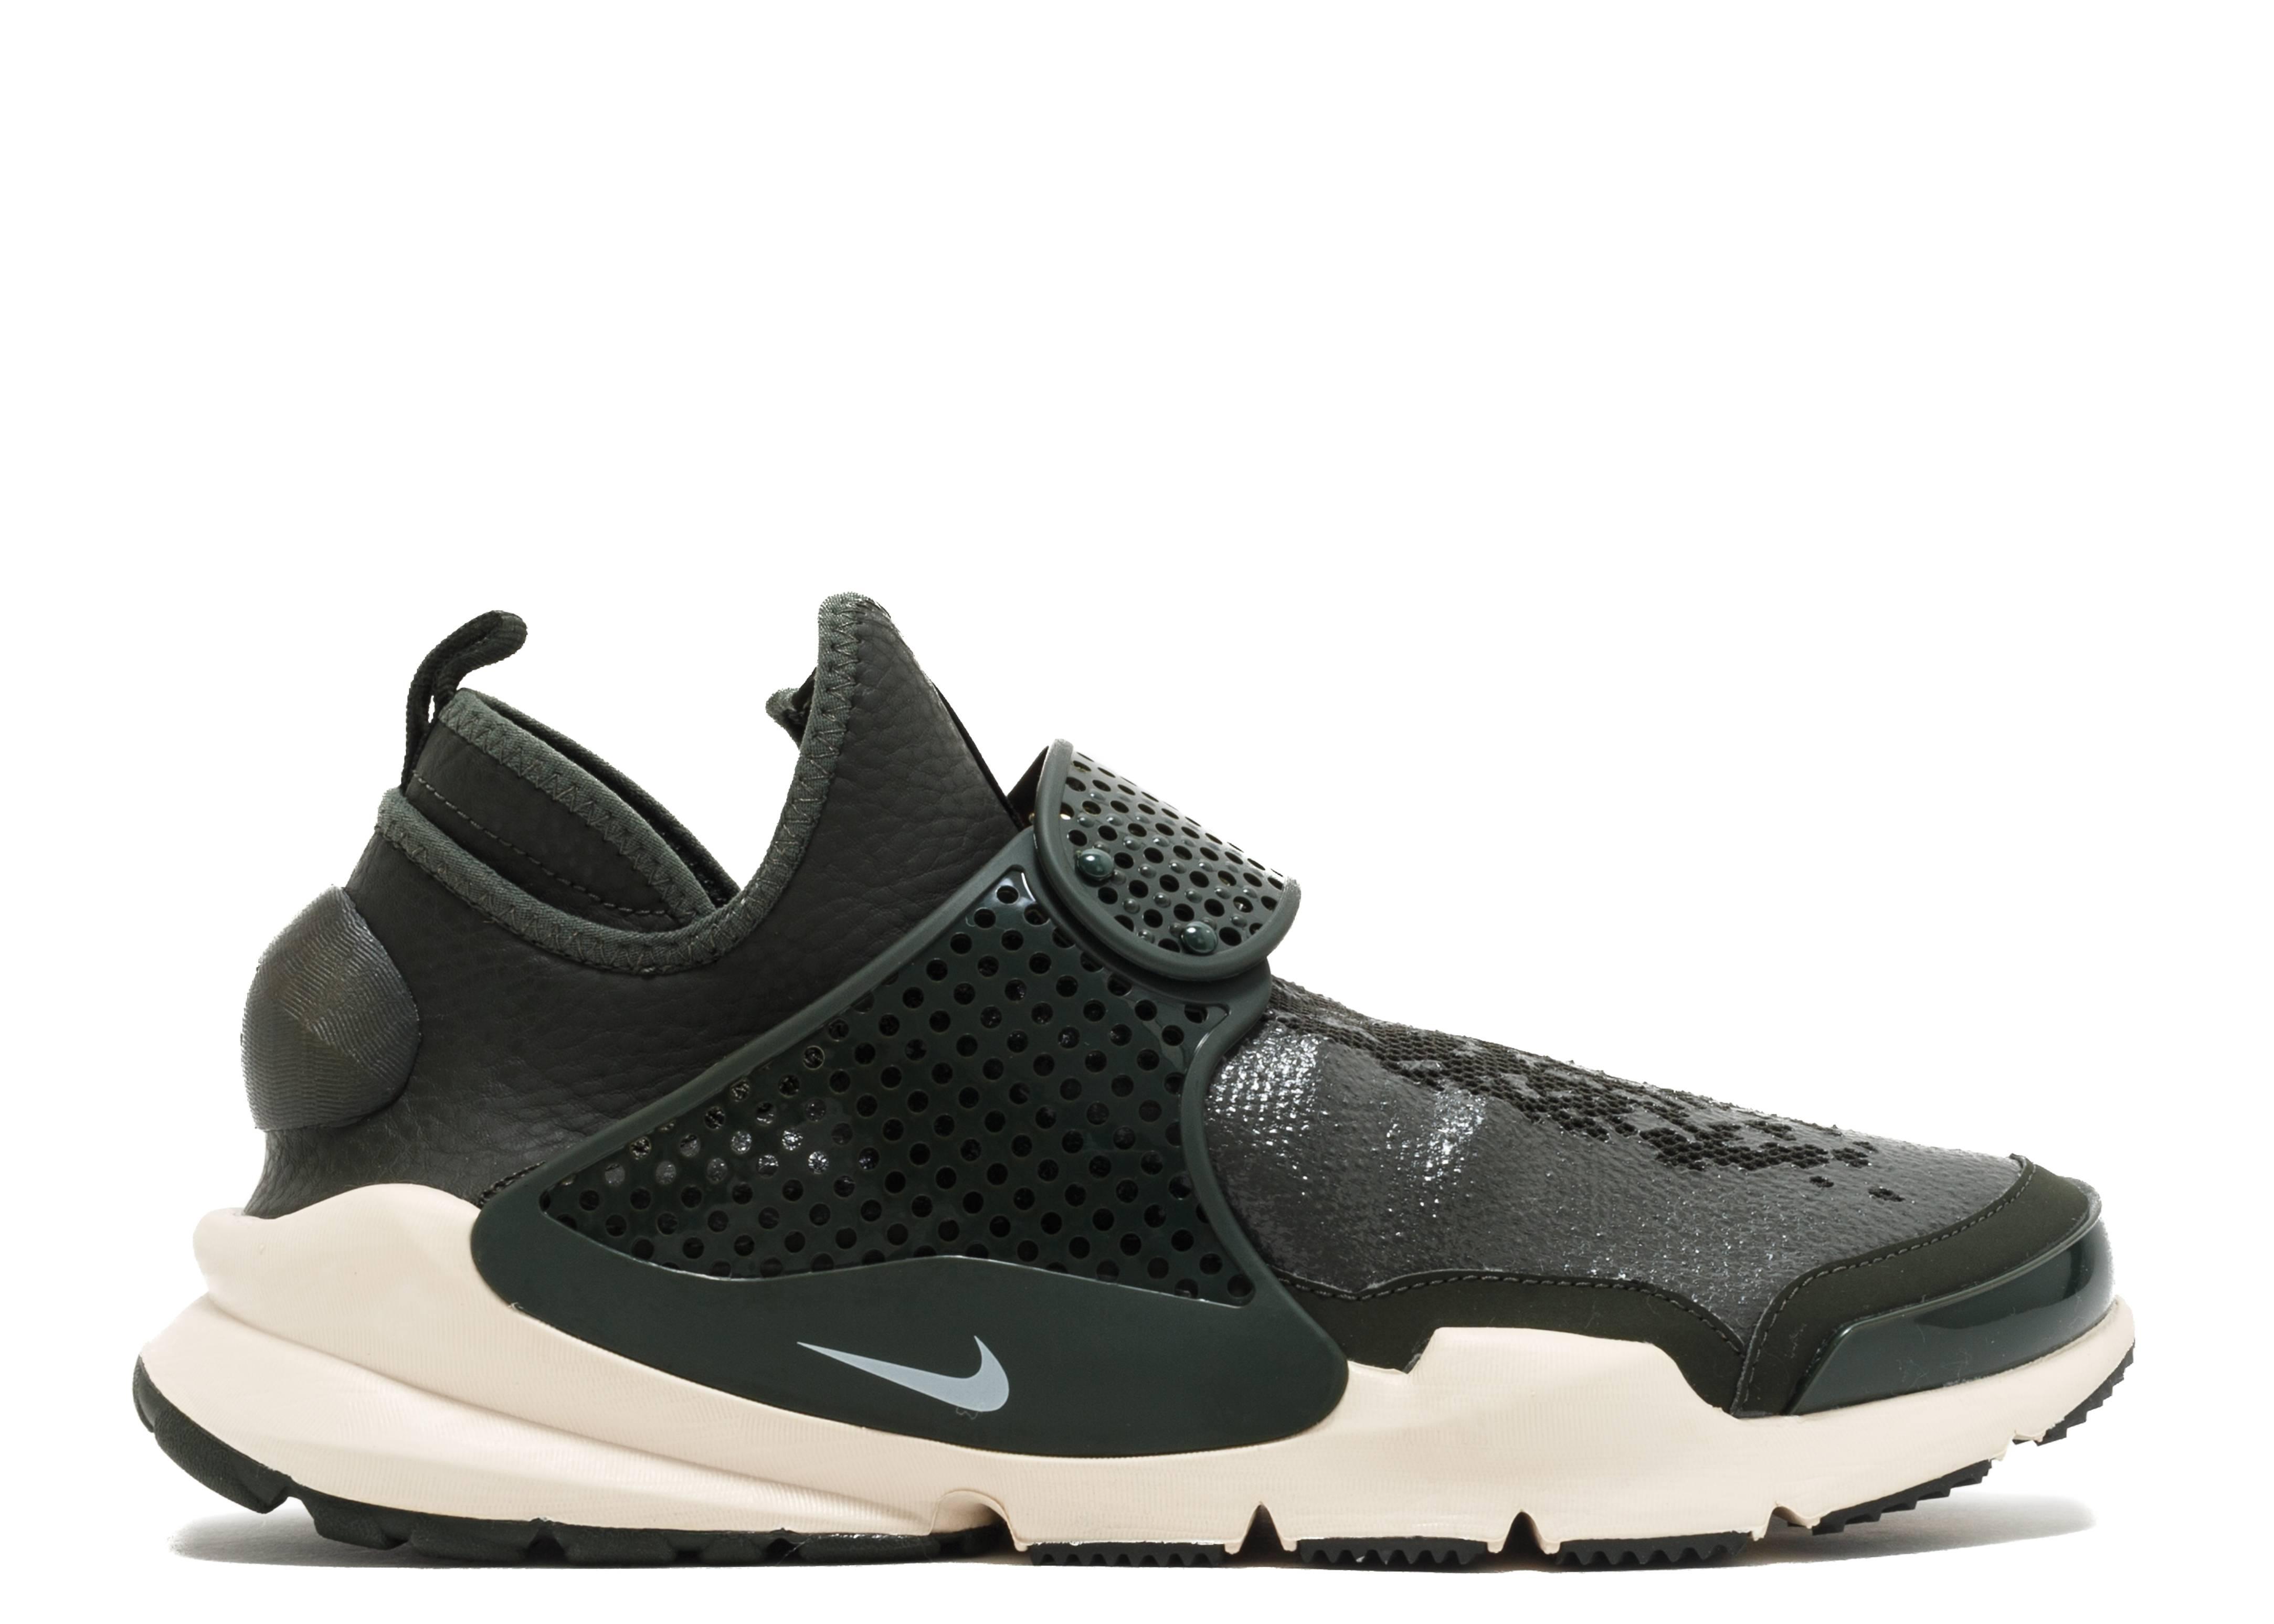 low priced f529c 3df50 ... x Stone Island Sock Dart Mid SI (dark green cream white) - Nike Sock  Dart Mid SI ...